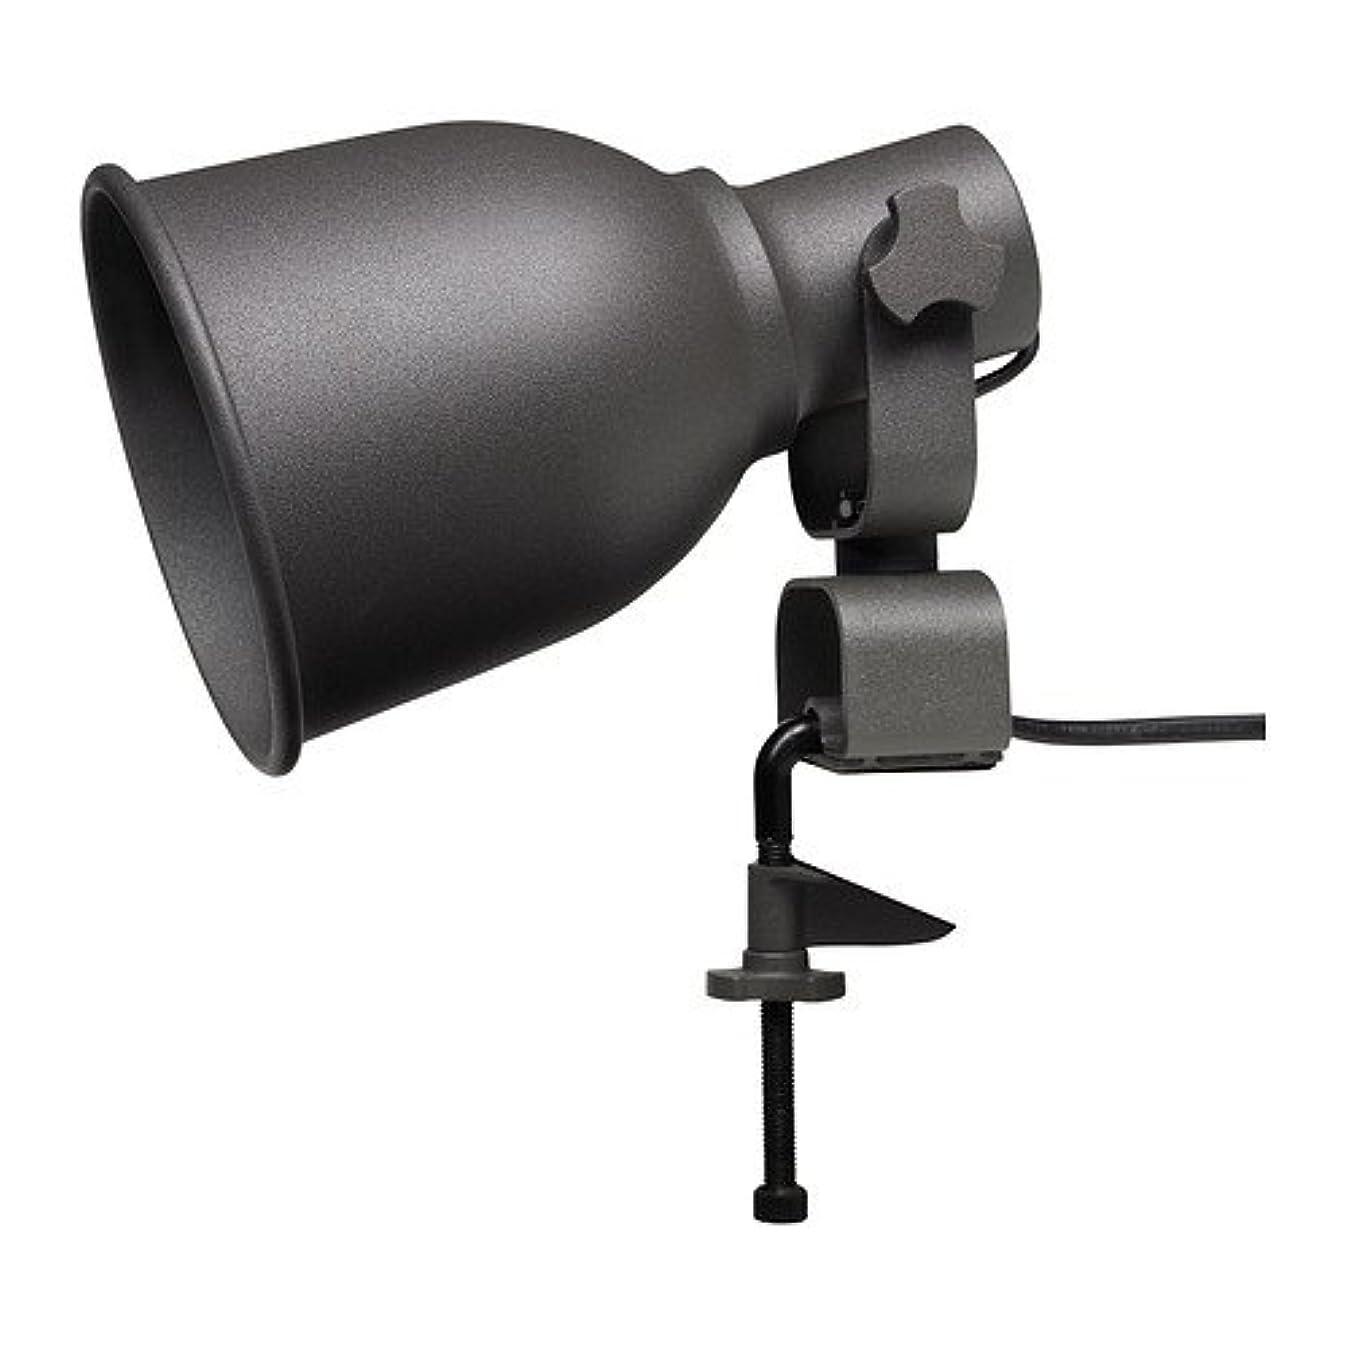 Ikea Hektar Clamp Lamp Wall Spotlight (Black)